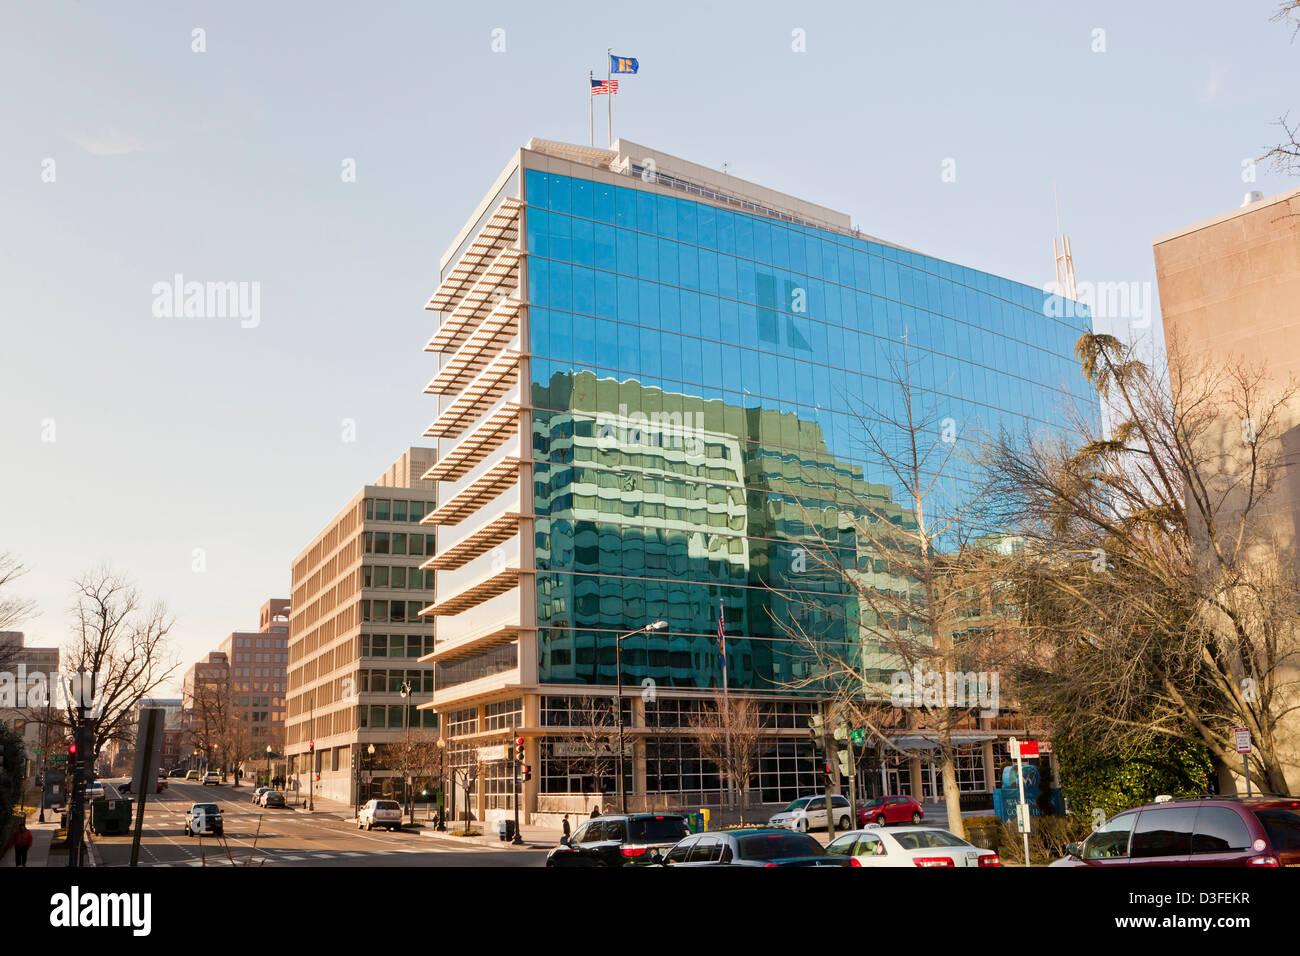 National Association of Realtors edificio - Washington, D.C. Imagen De Stock